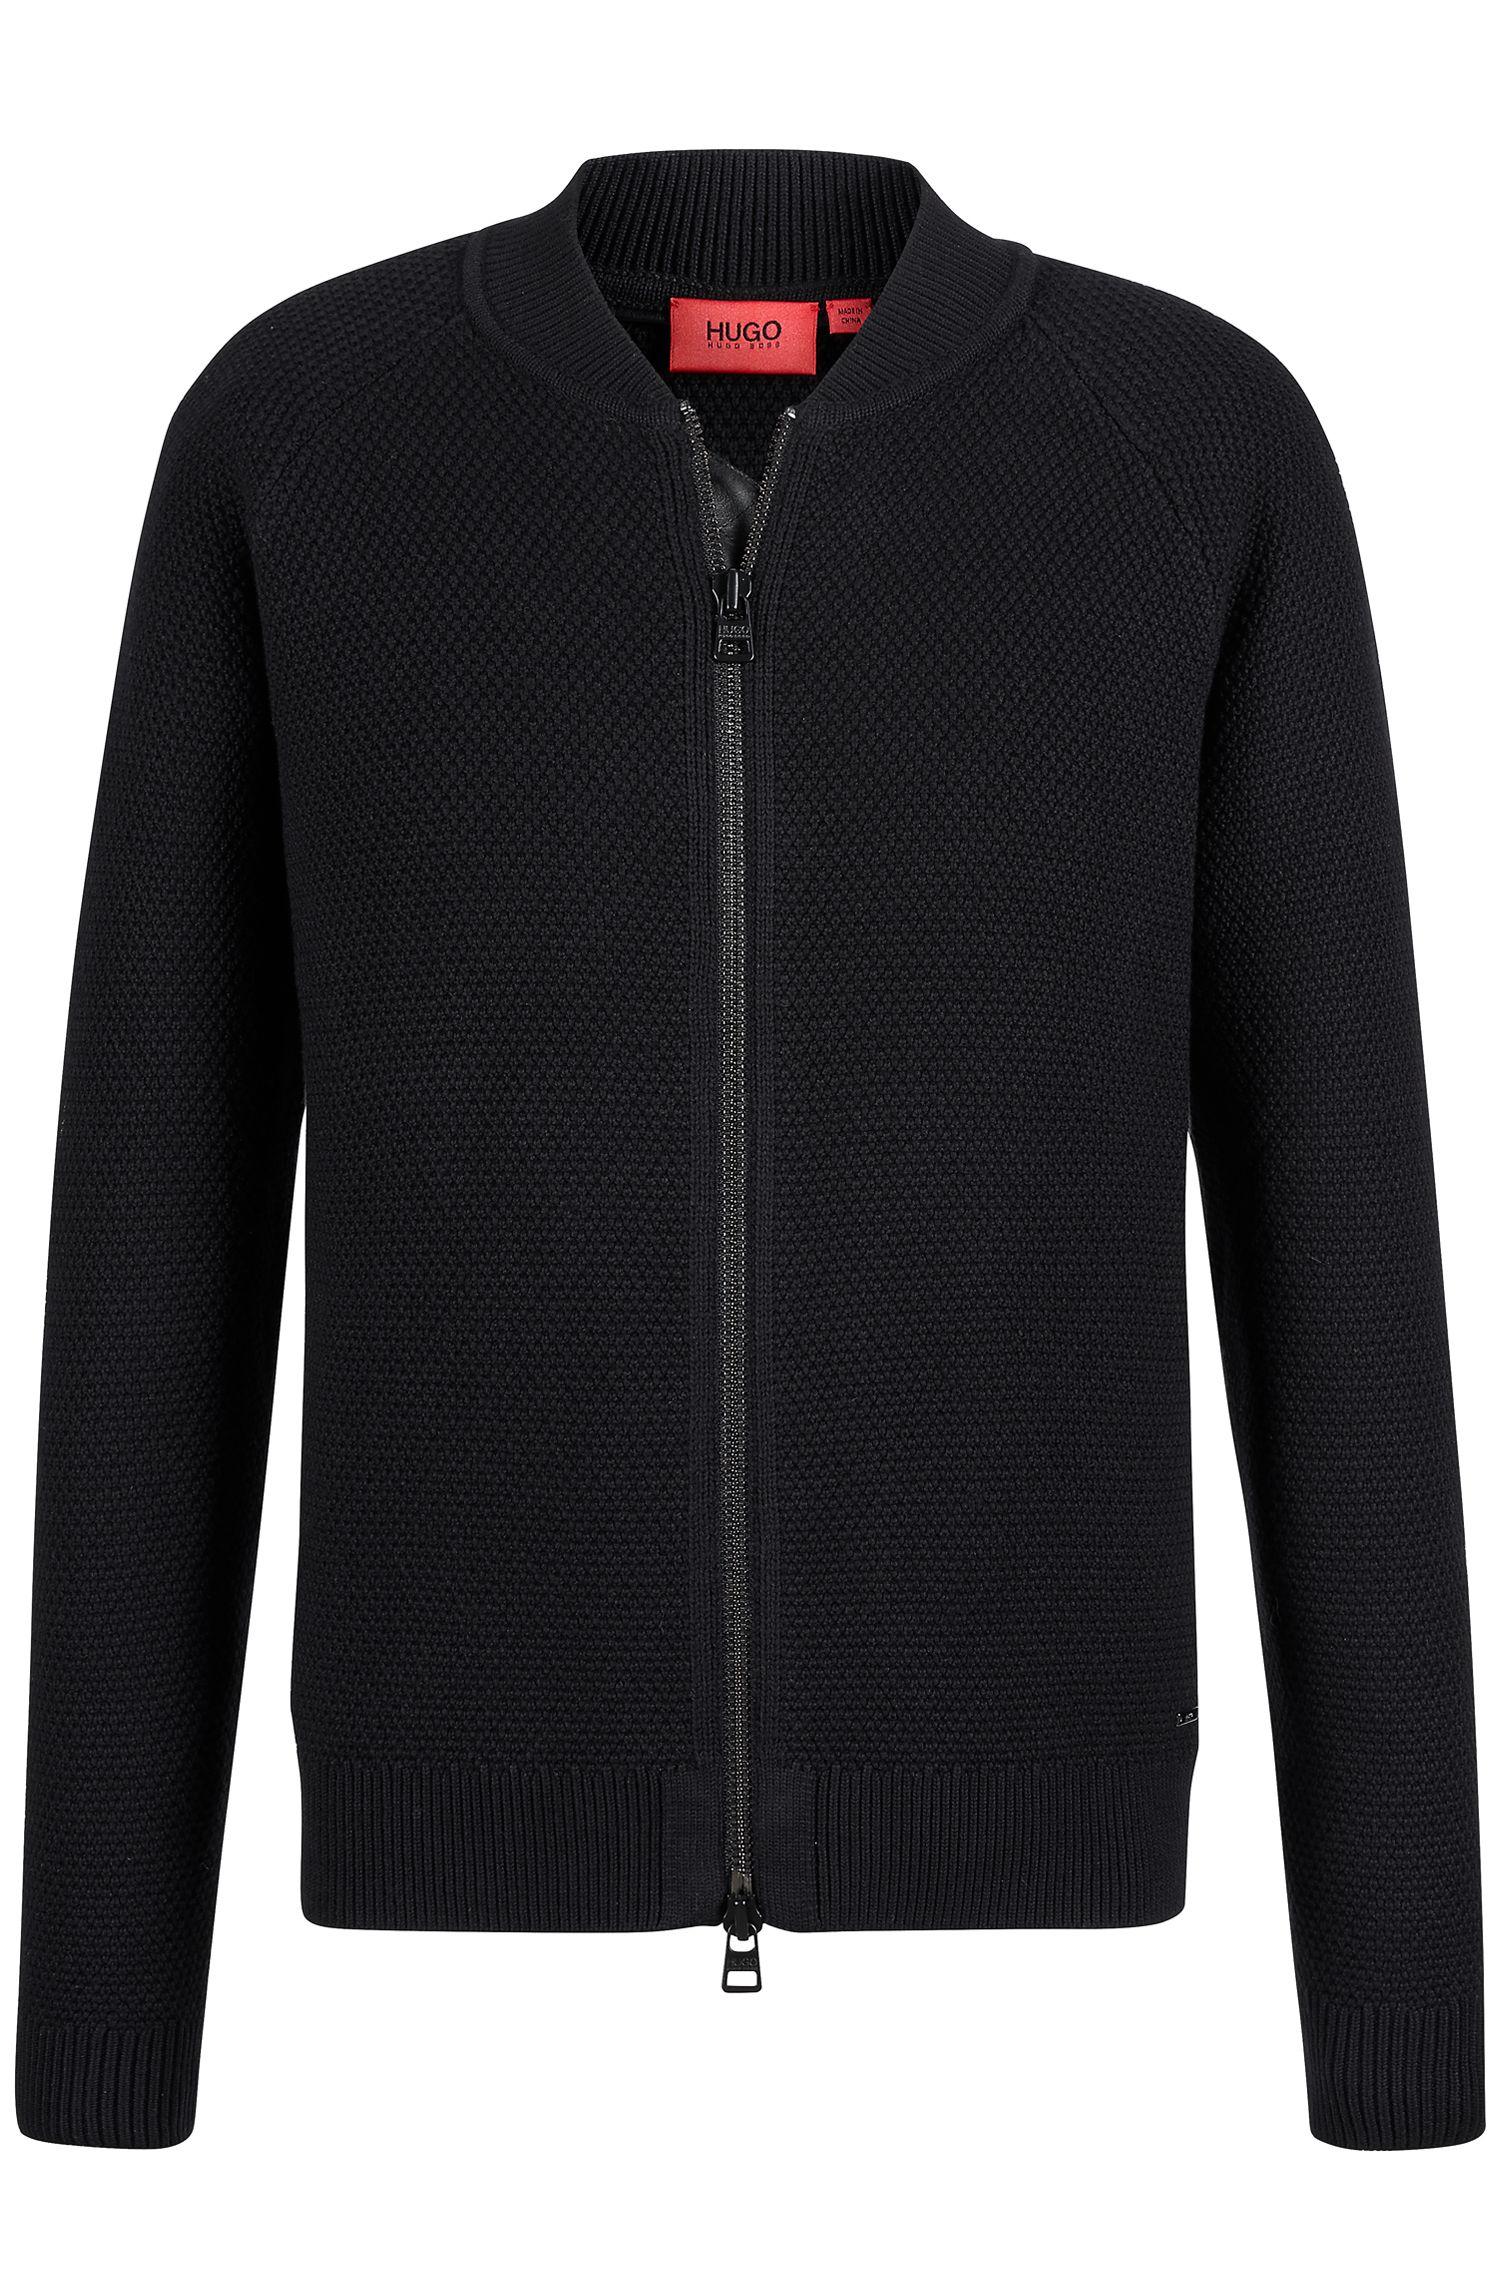 'Saio' | Virgin Wool Cotton Textured Zip Cardigan